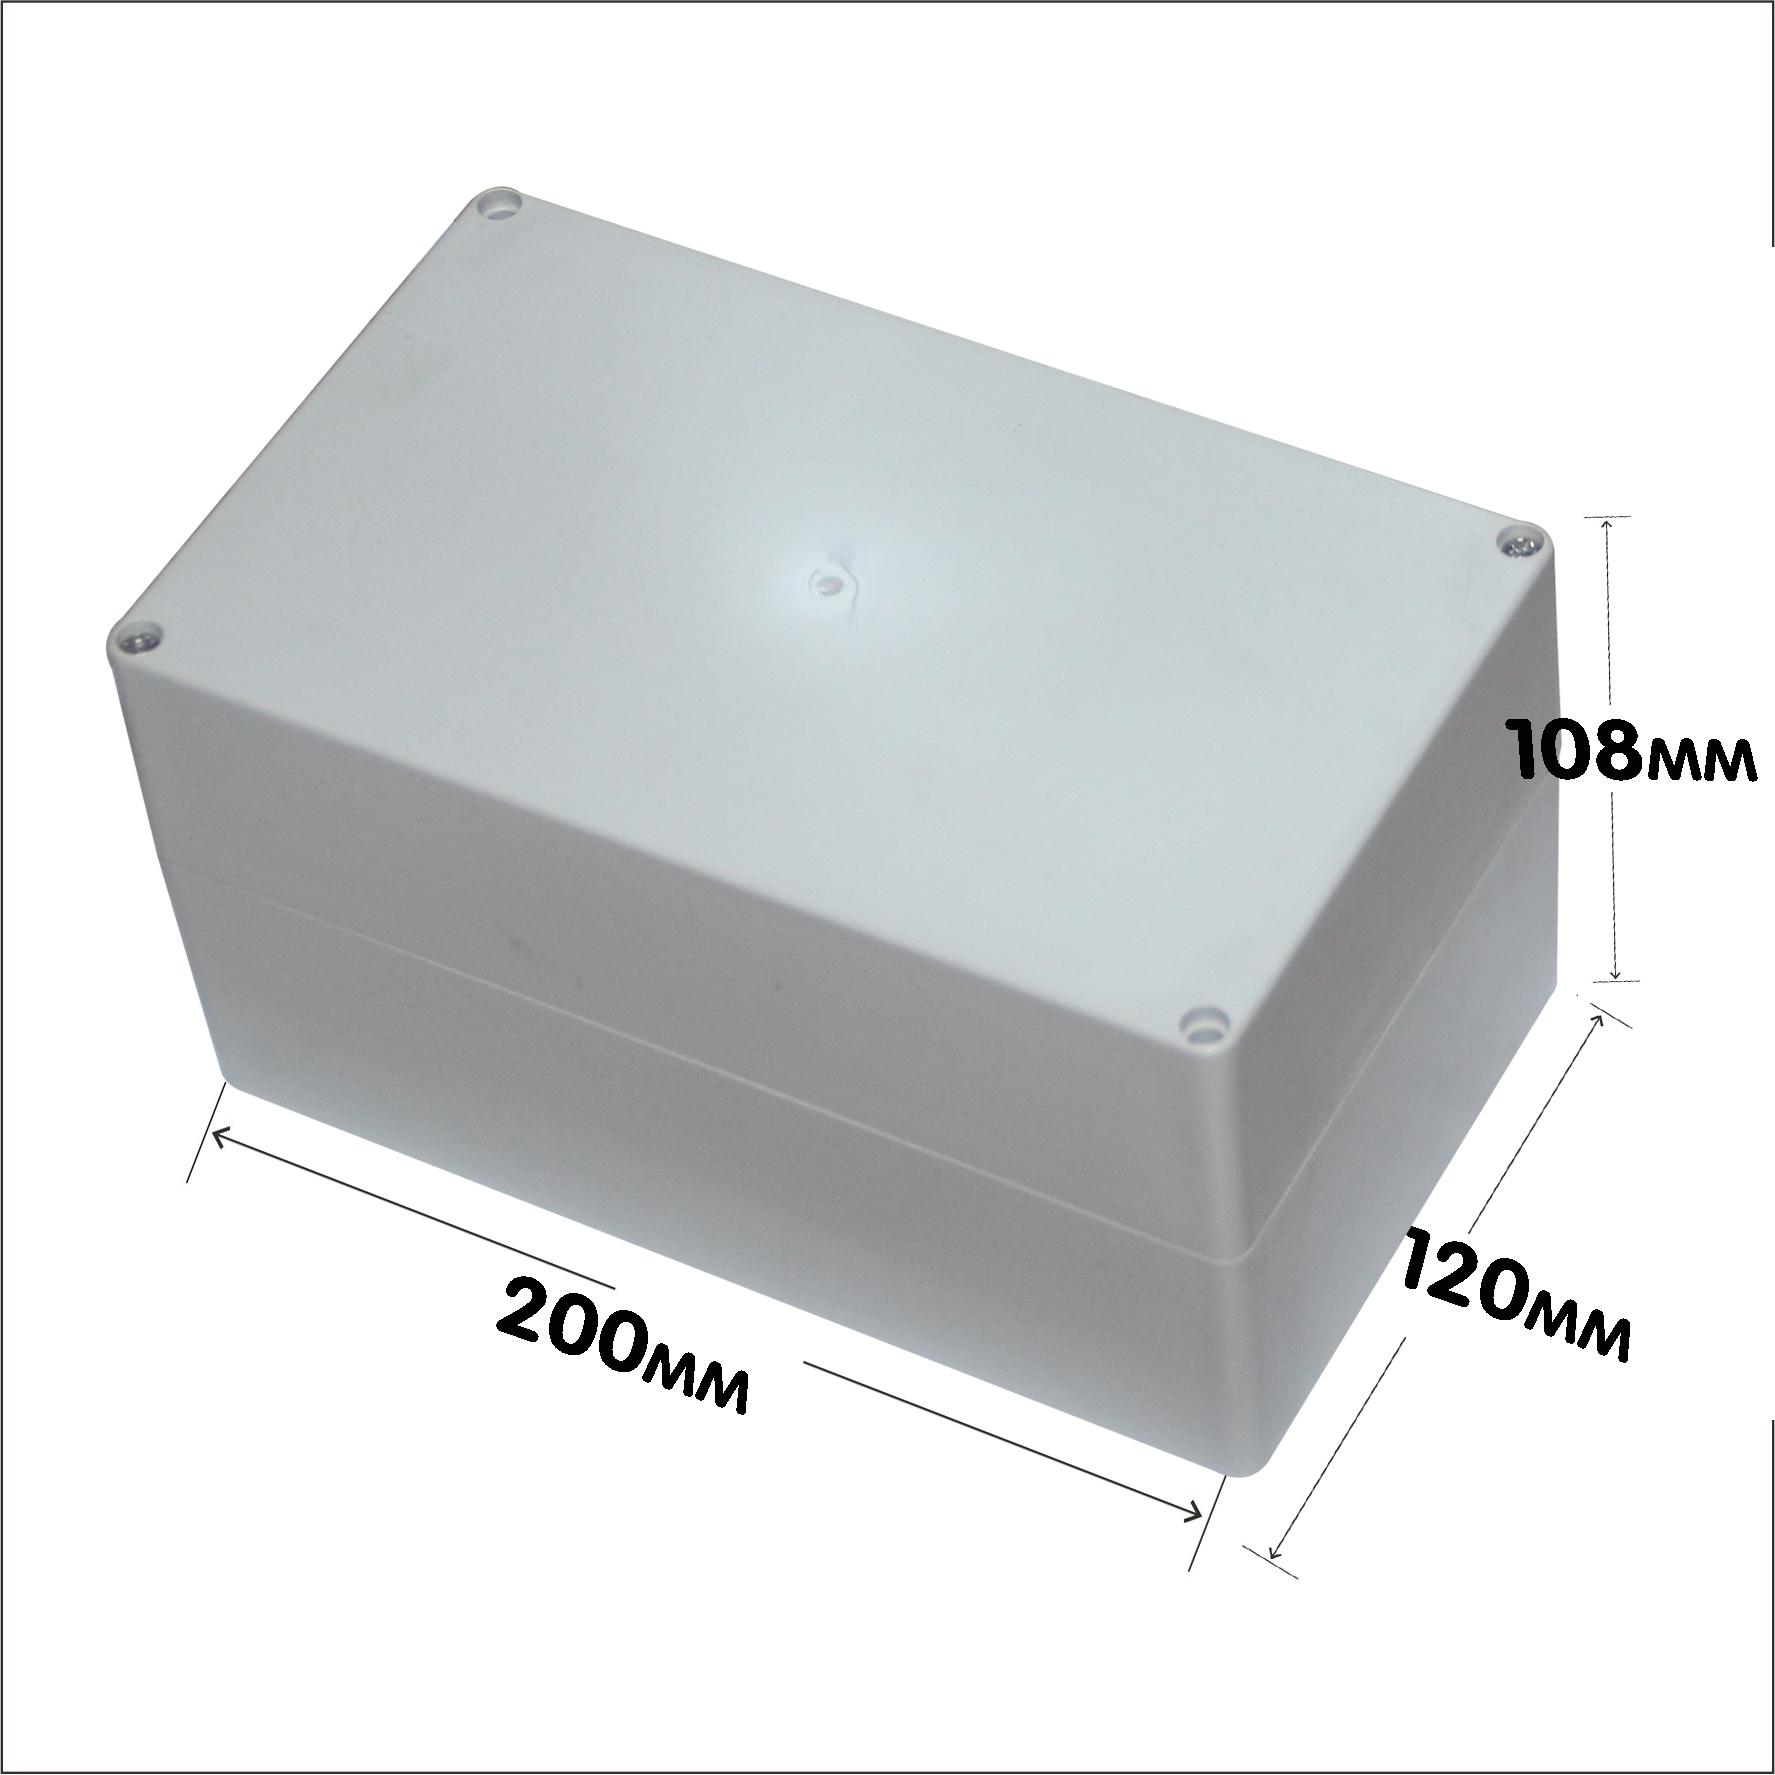 200mmX120mmX108mm plasthölje vattentät modul e - maskin - maskin.